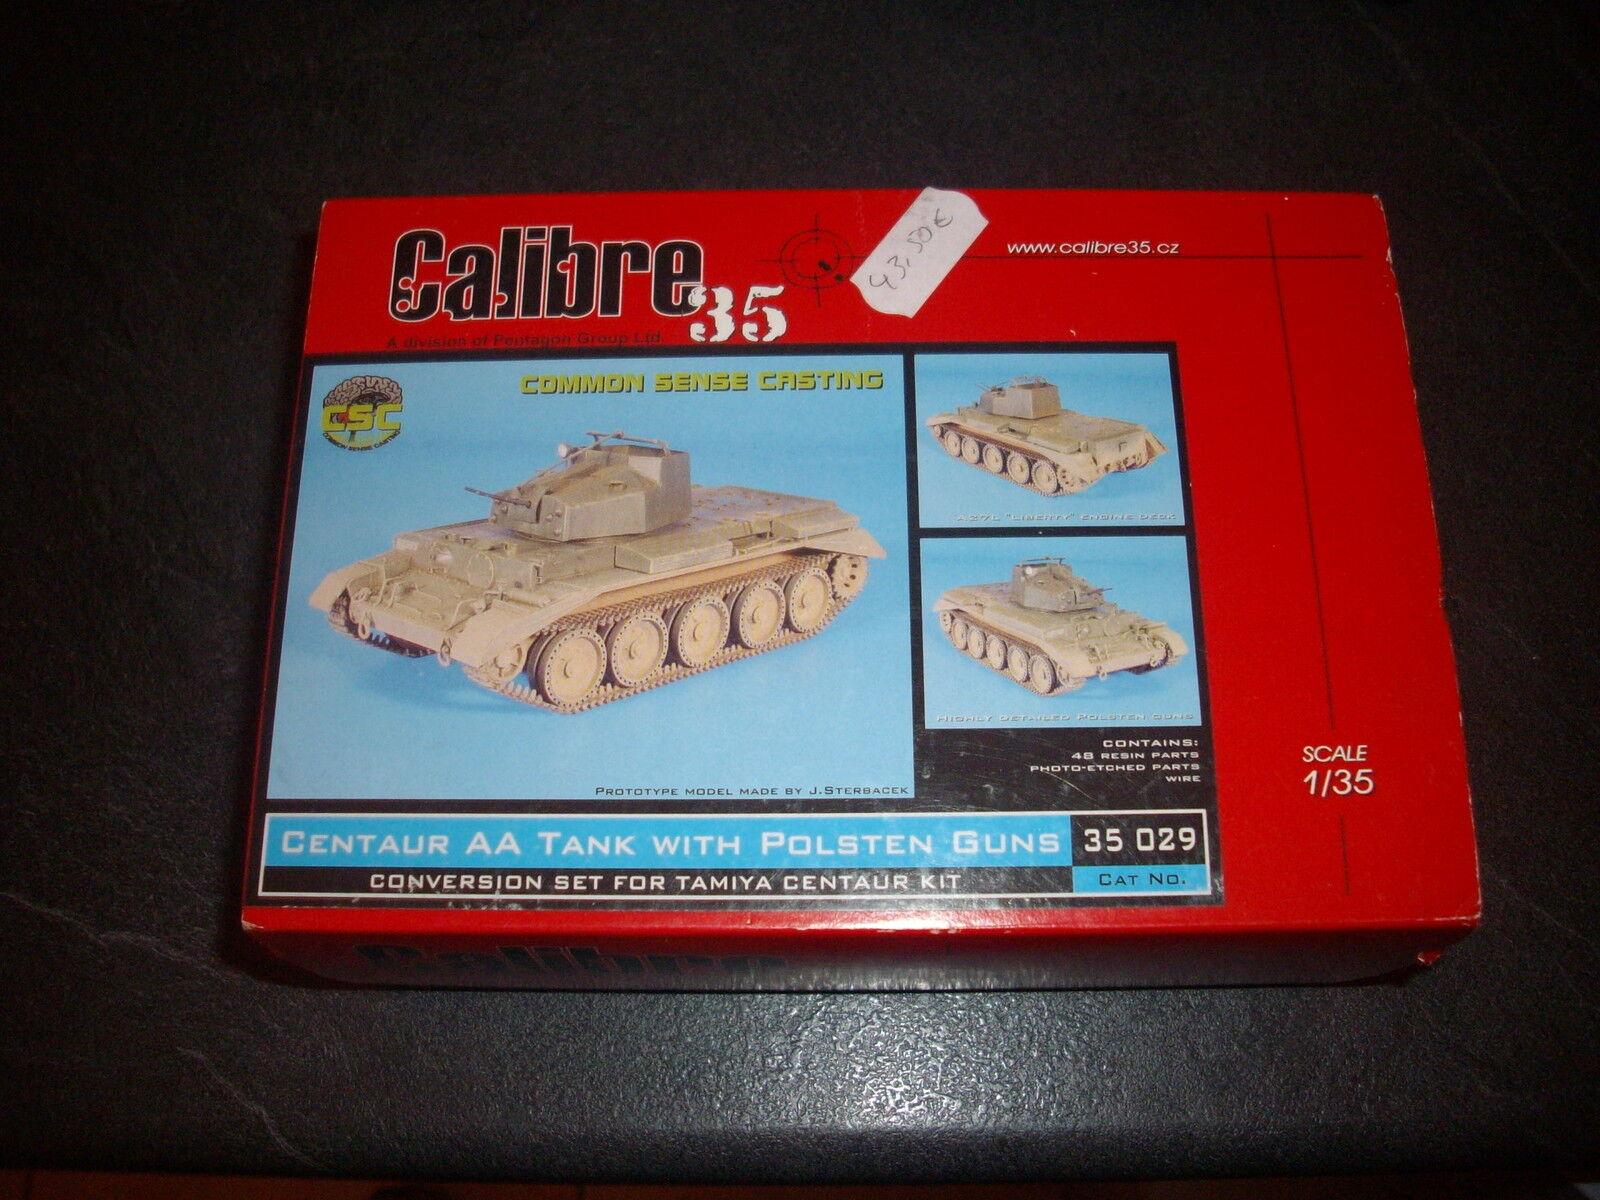 CALIBRE 35 CENTAUR AA TANK WITH POLSTEN GUNS  REF 35029